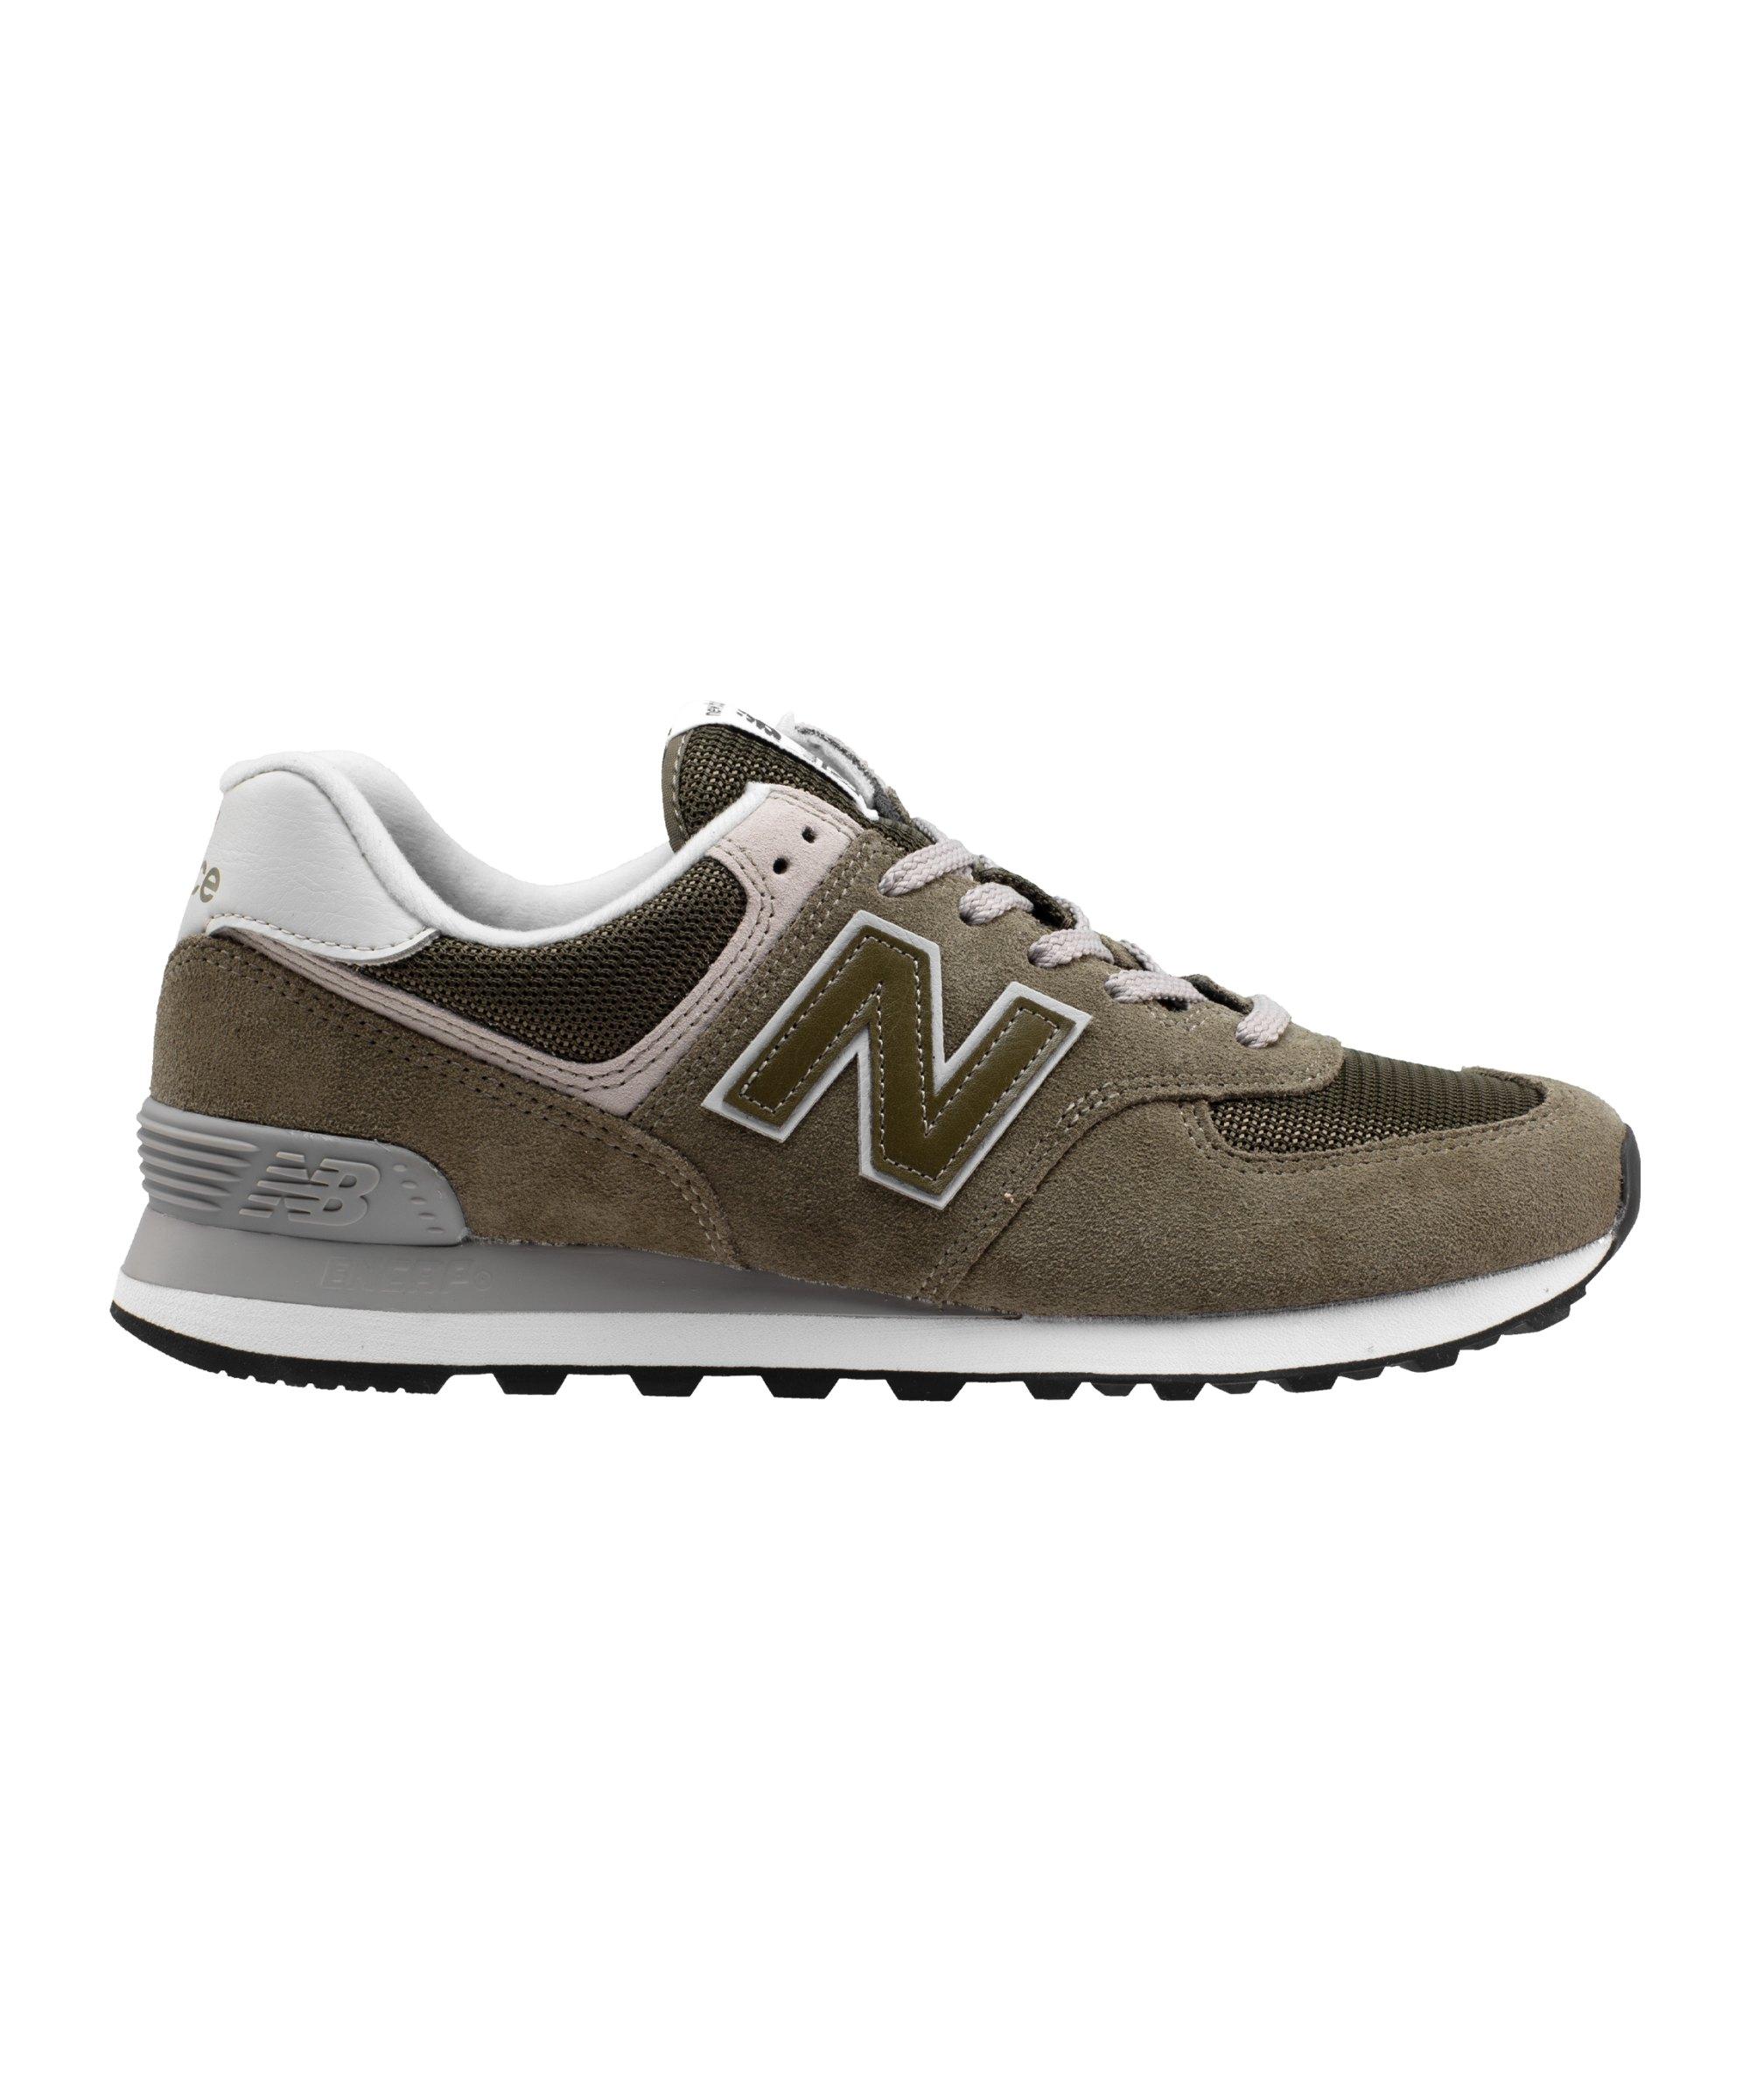 New Balance ML574 Sneaker Grün F63 - gruen